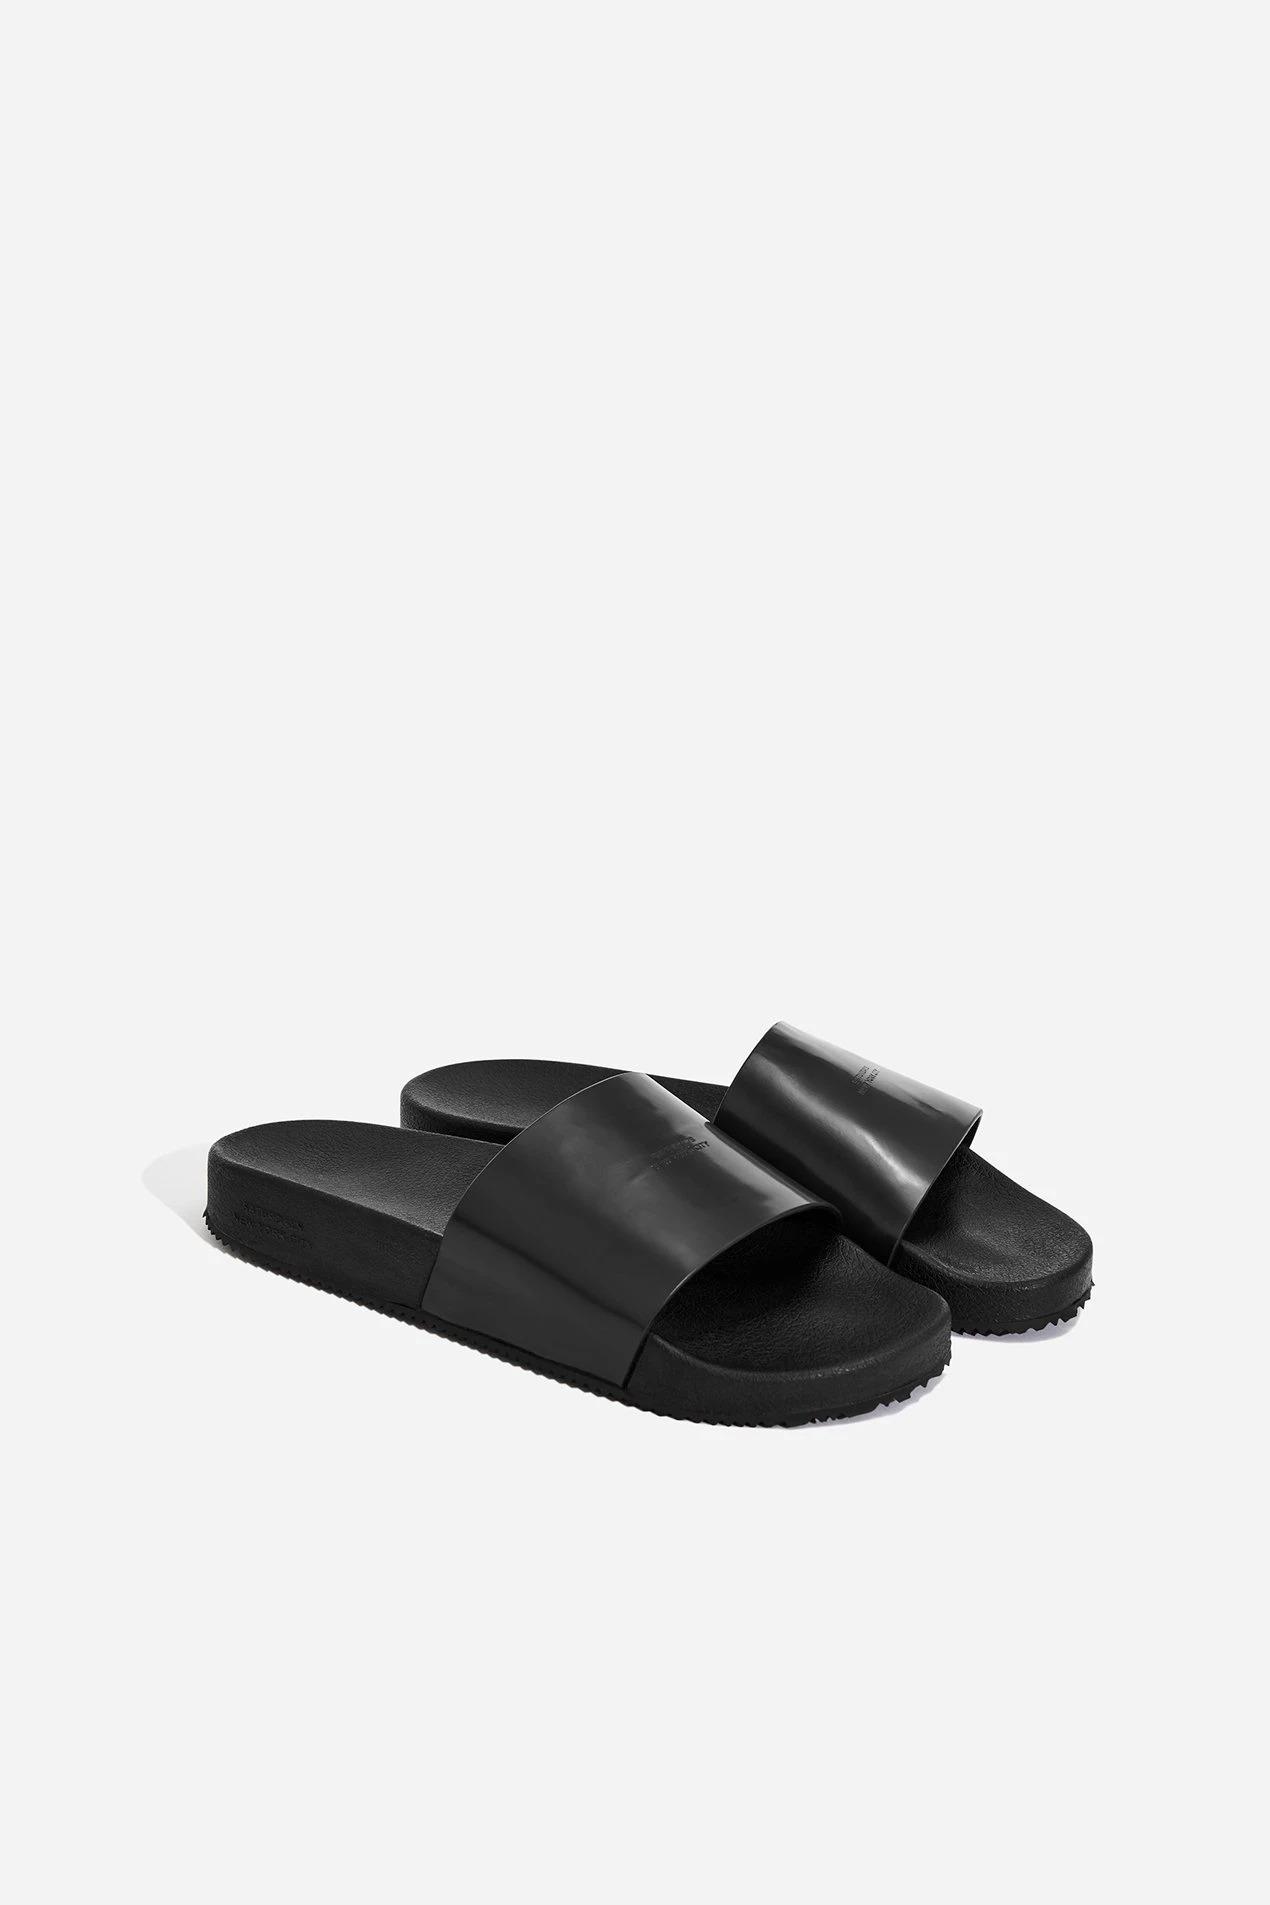 Saturdays NYC Banya Leather Slides in black